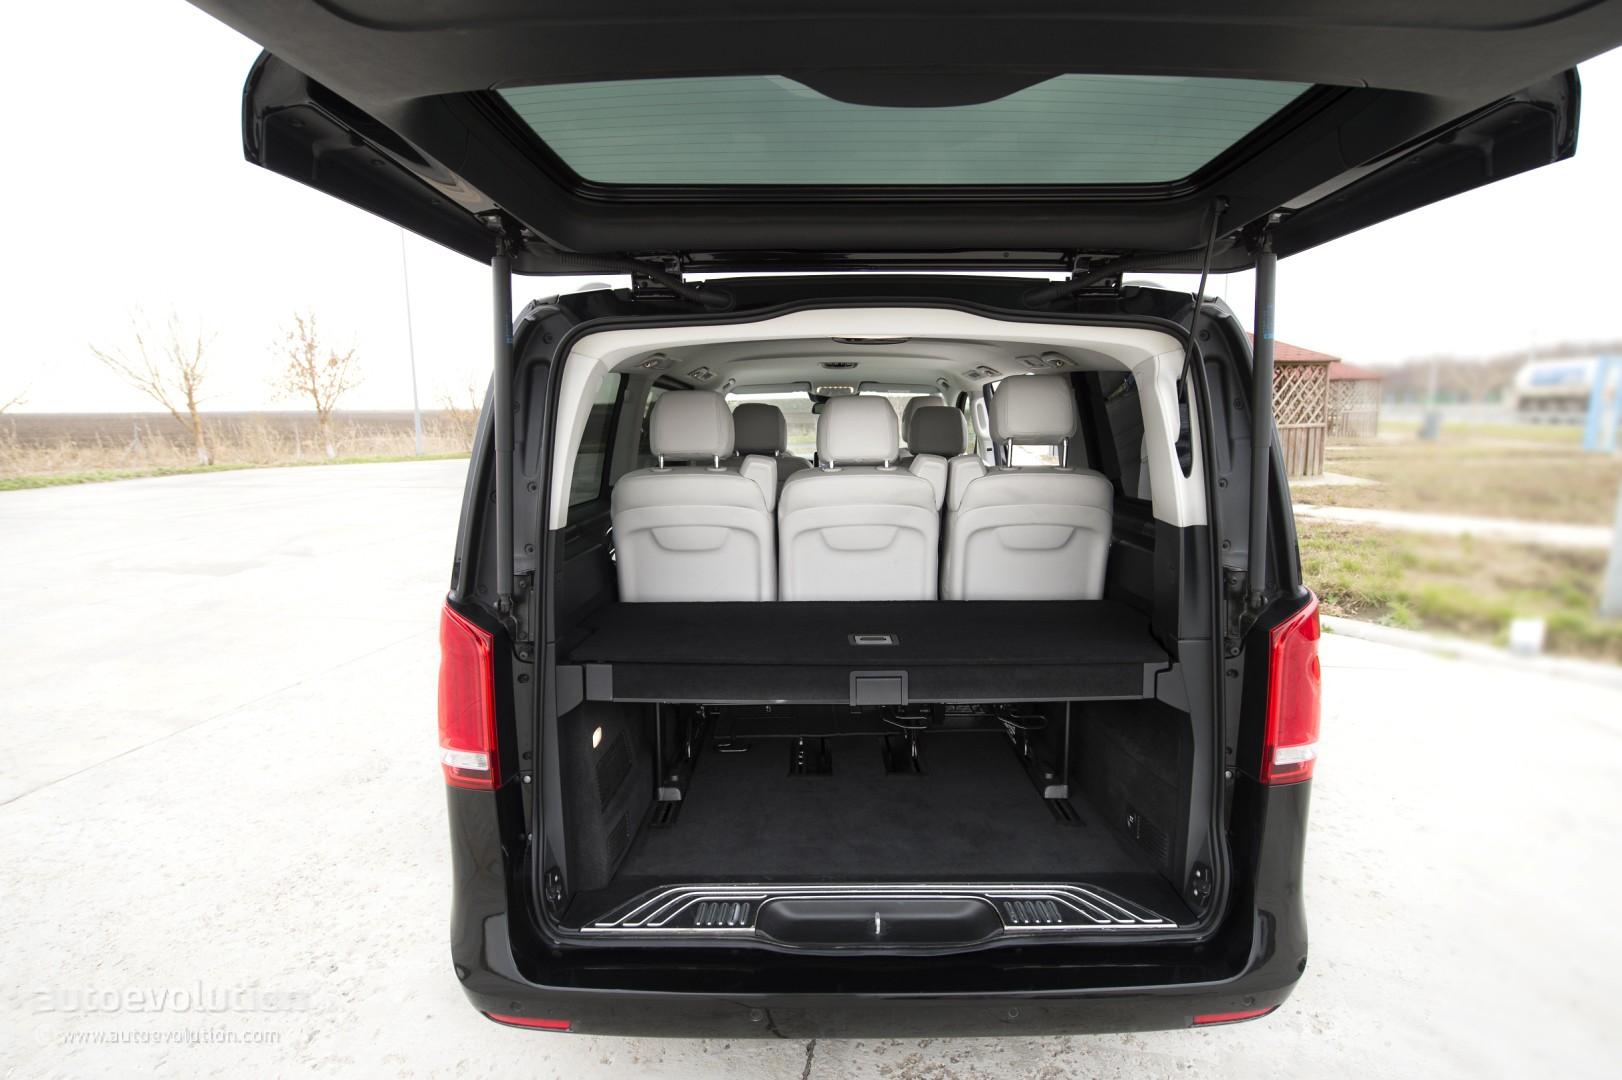 2015 mercedes benz v class review autoevolution. Black Bedroom Furniture Sets. Home Design Ideas